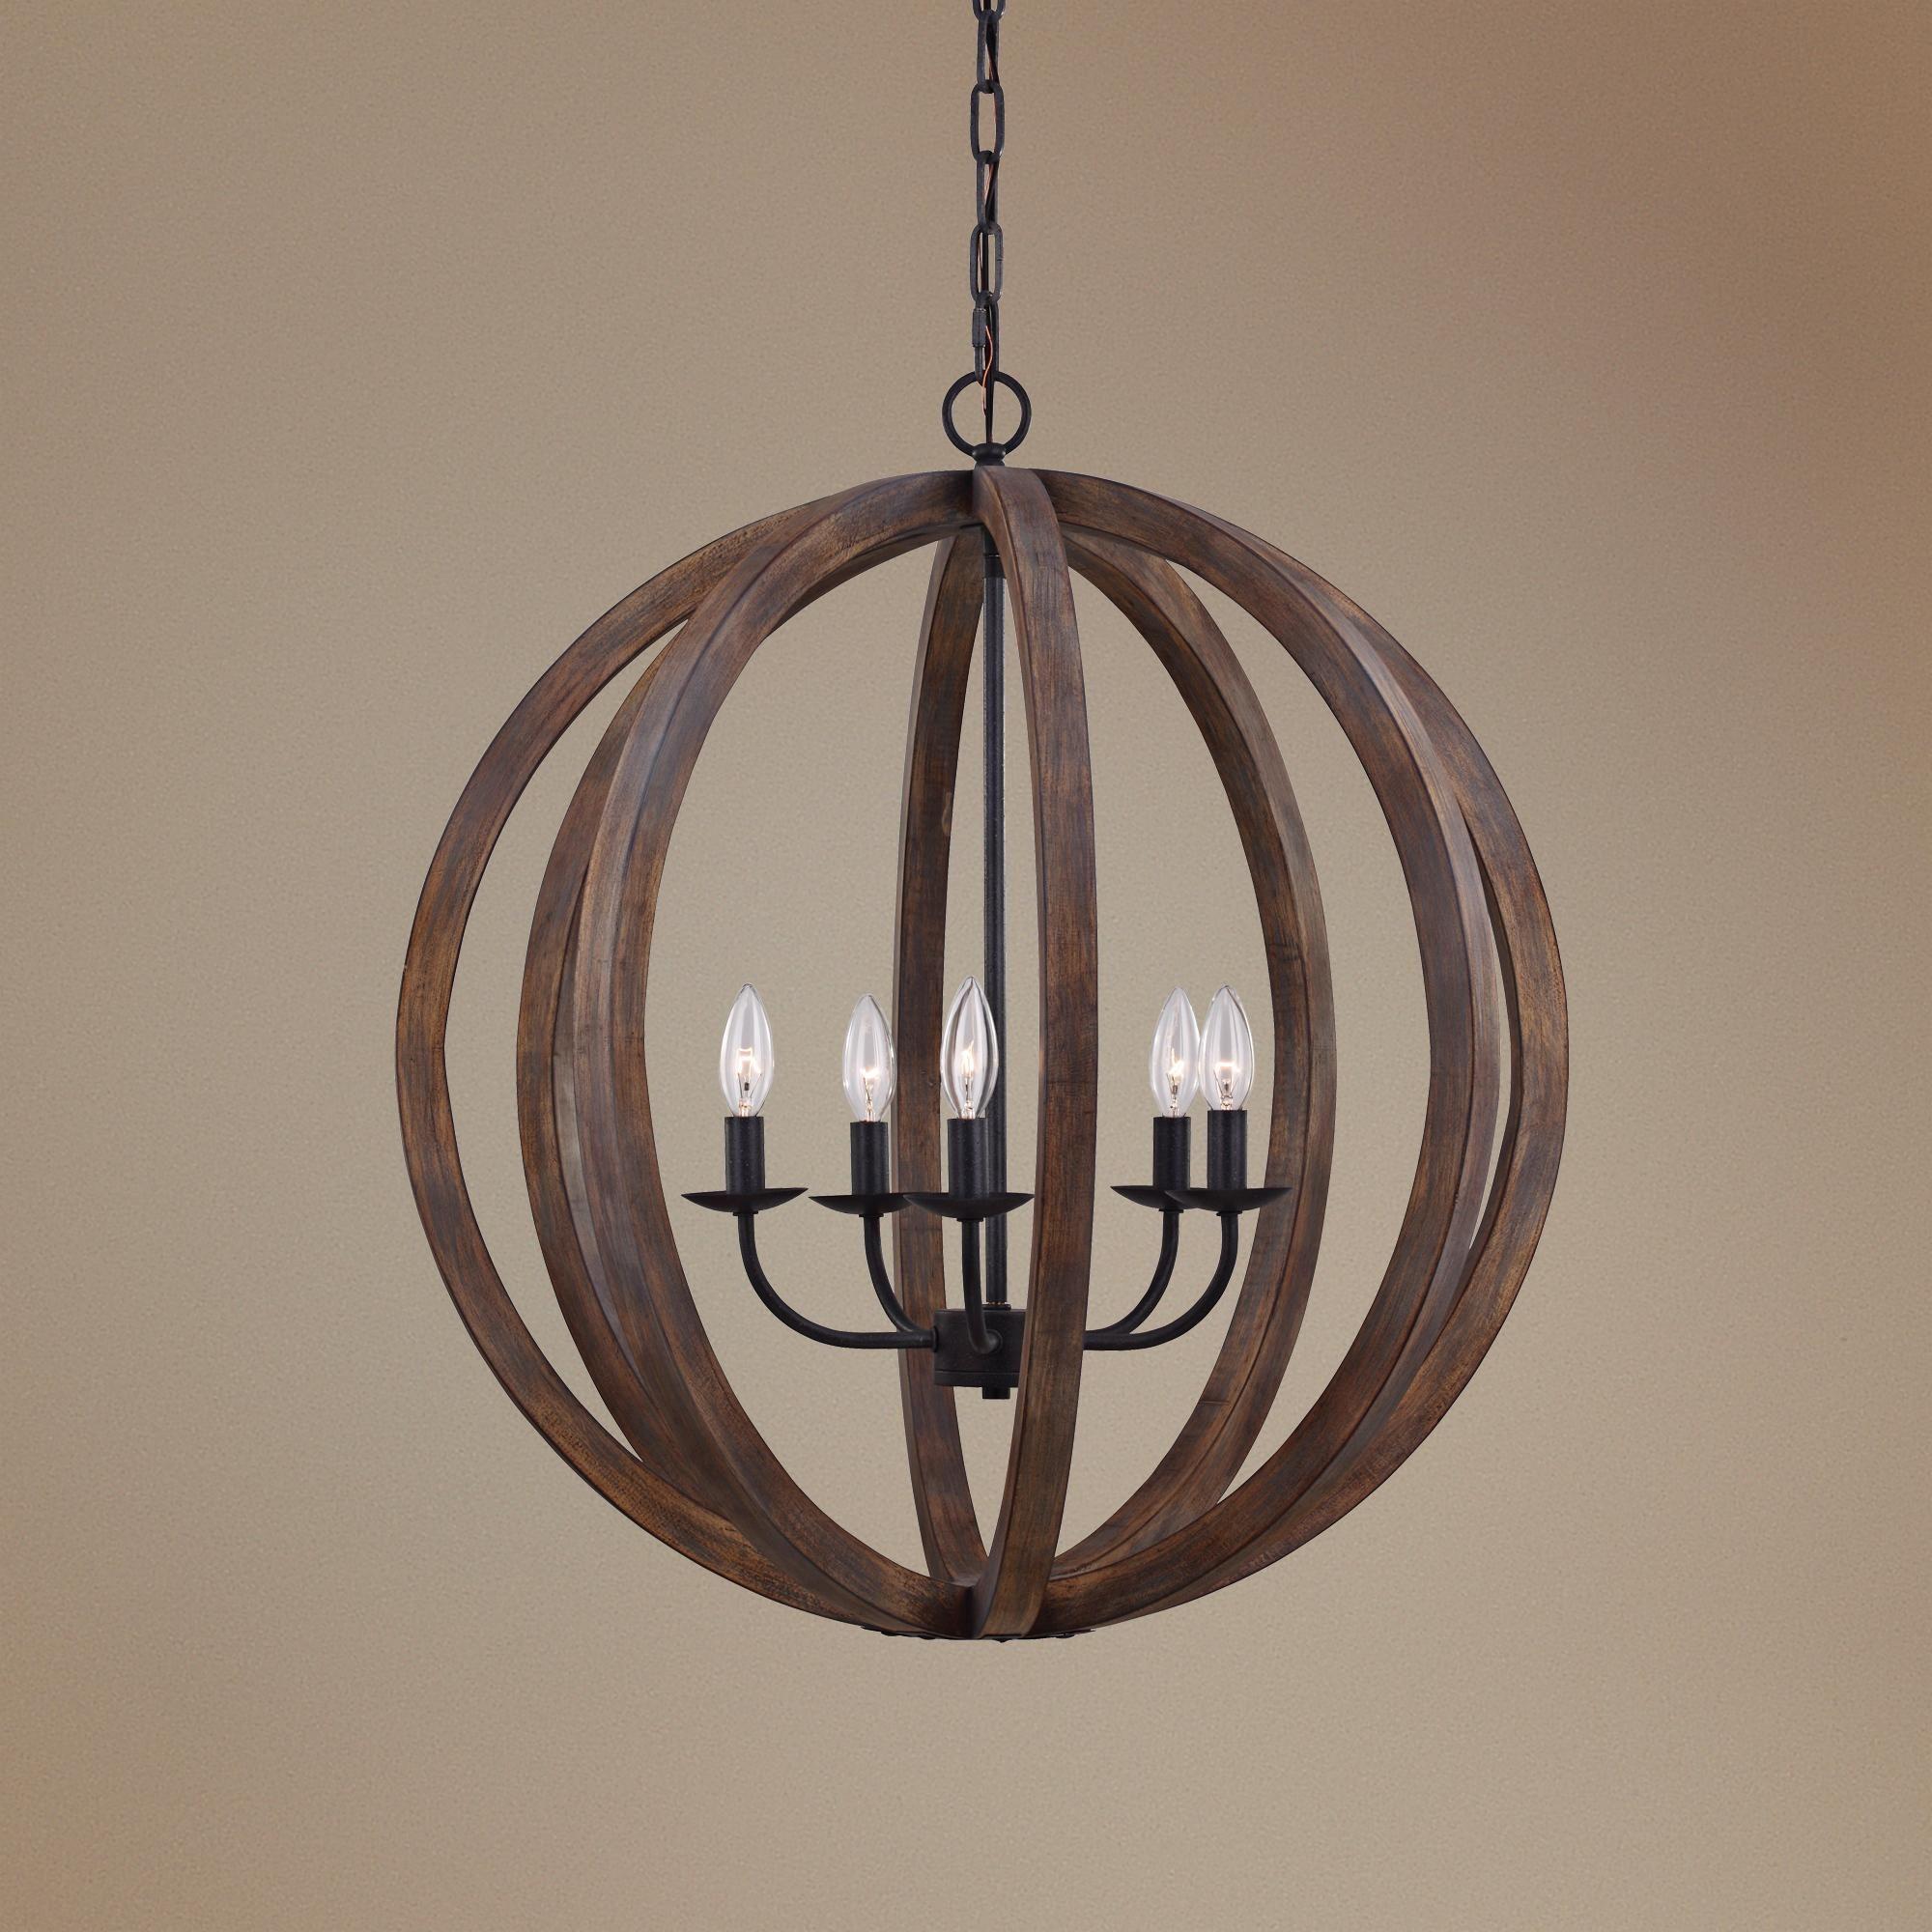 Feiss Allier 26 Wide Weathered Oak Wood Pendant Light -